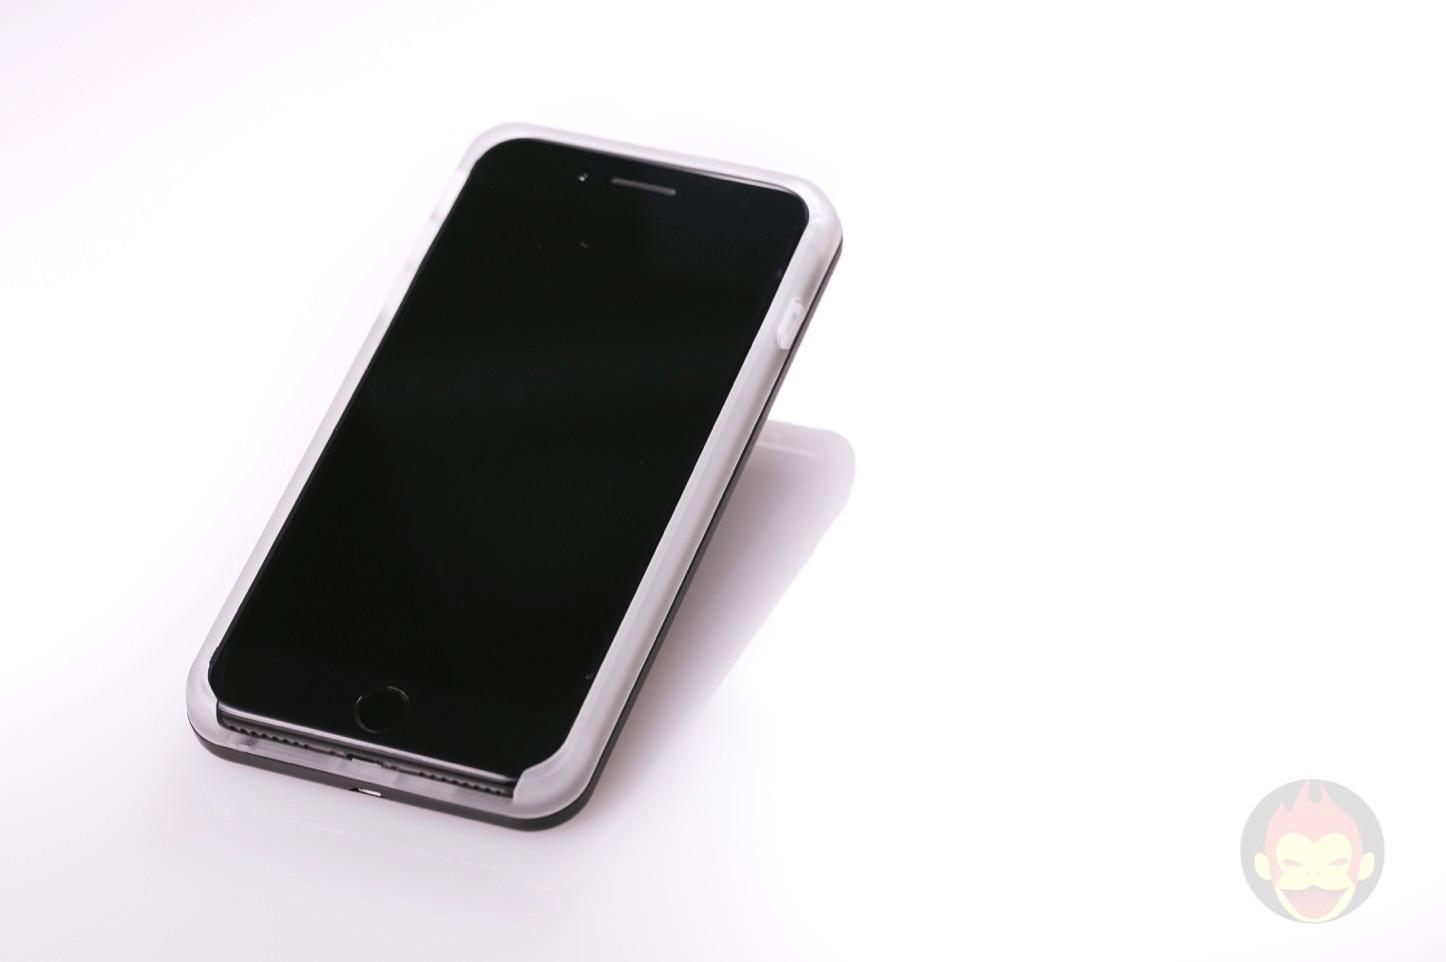 LuMee-Duo-LED-Lighting-Case-01.jpg